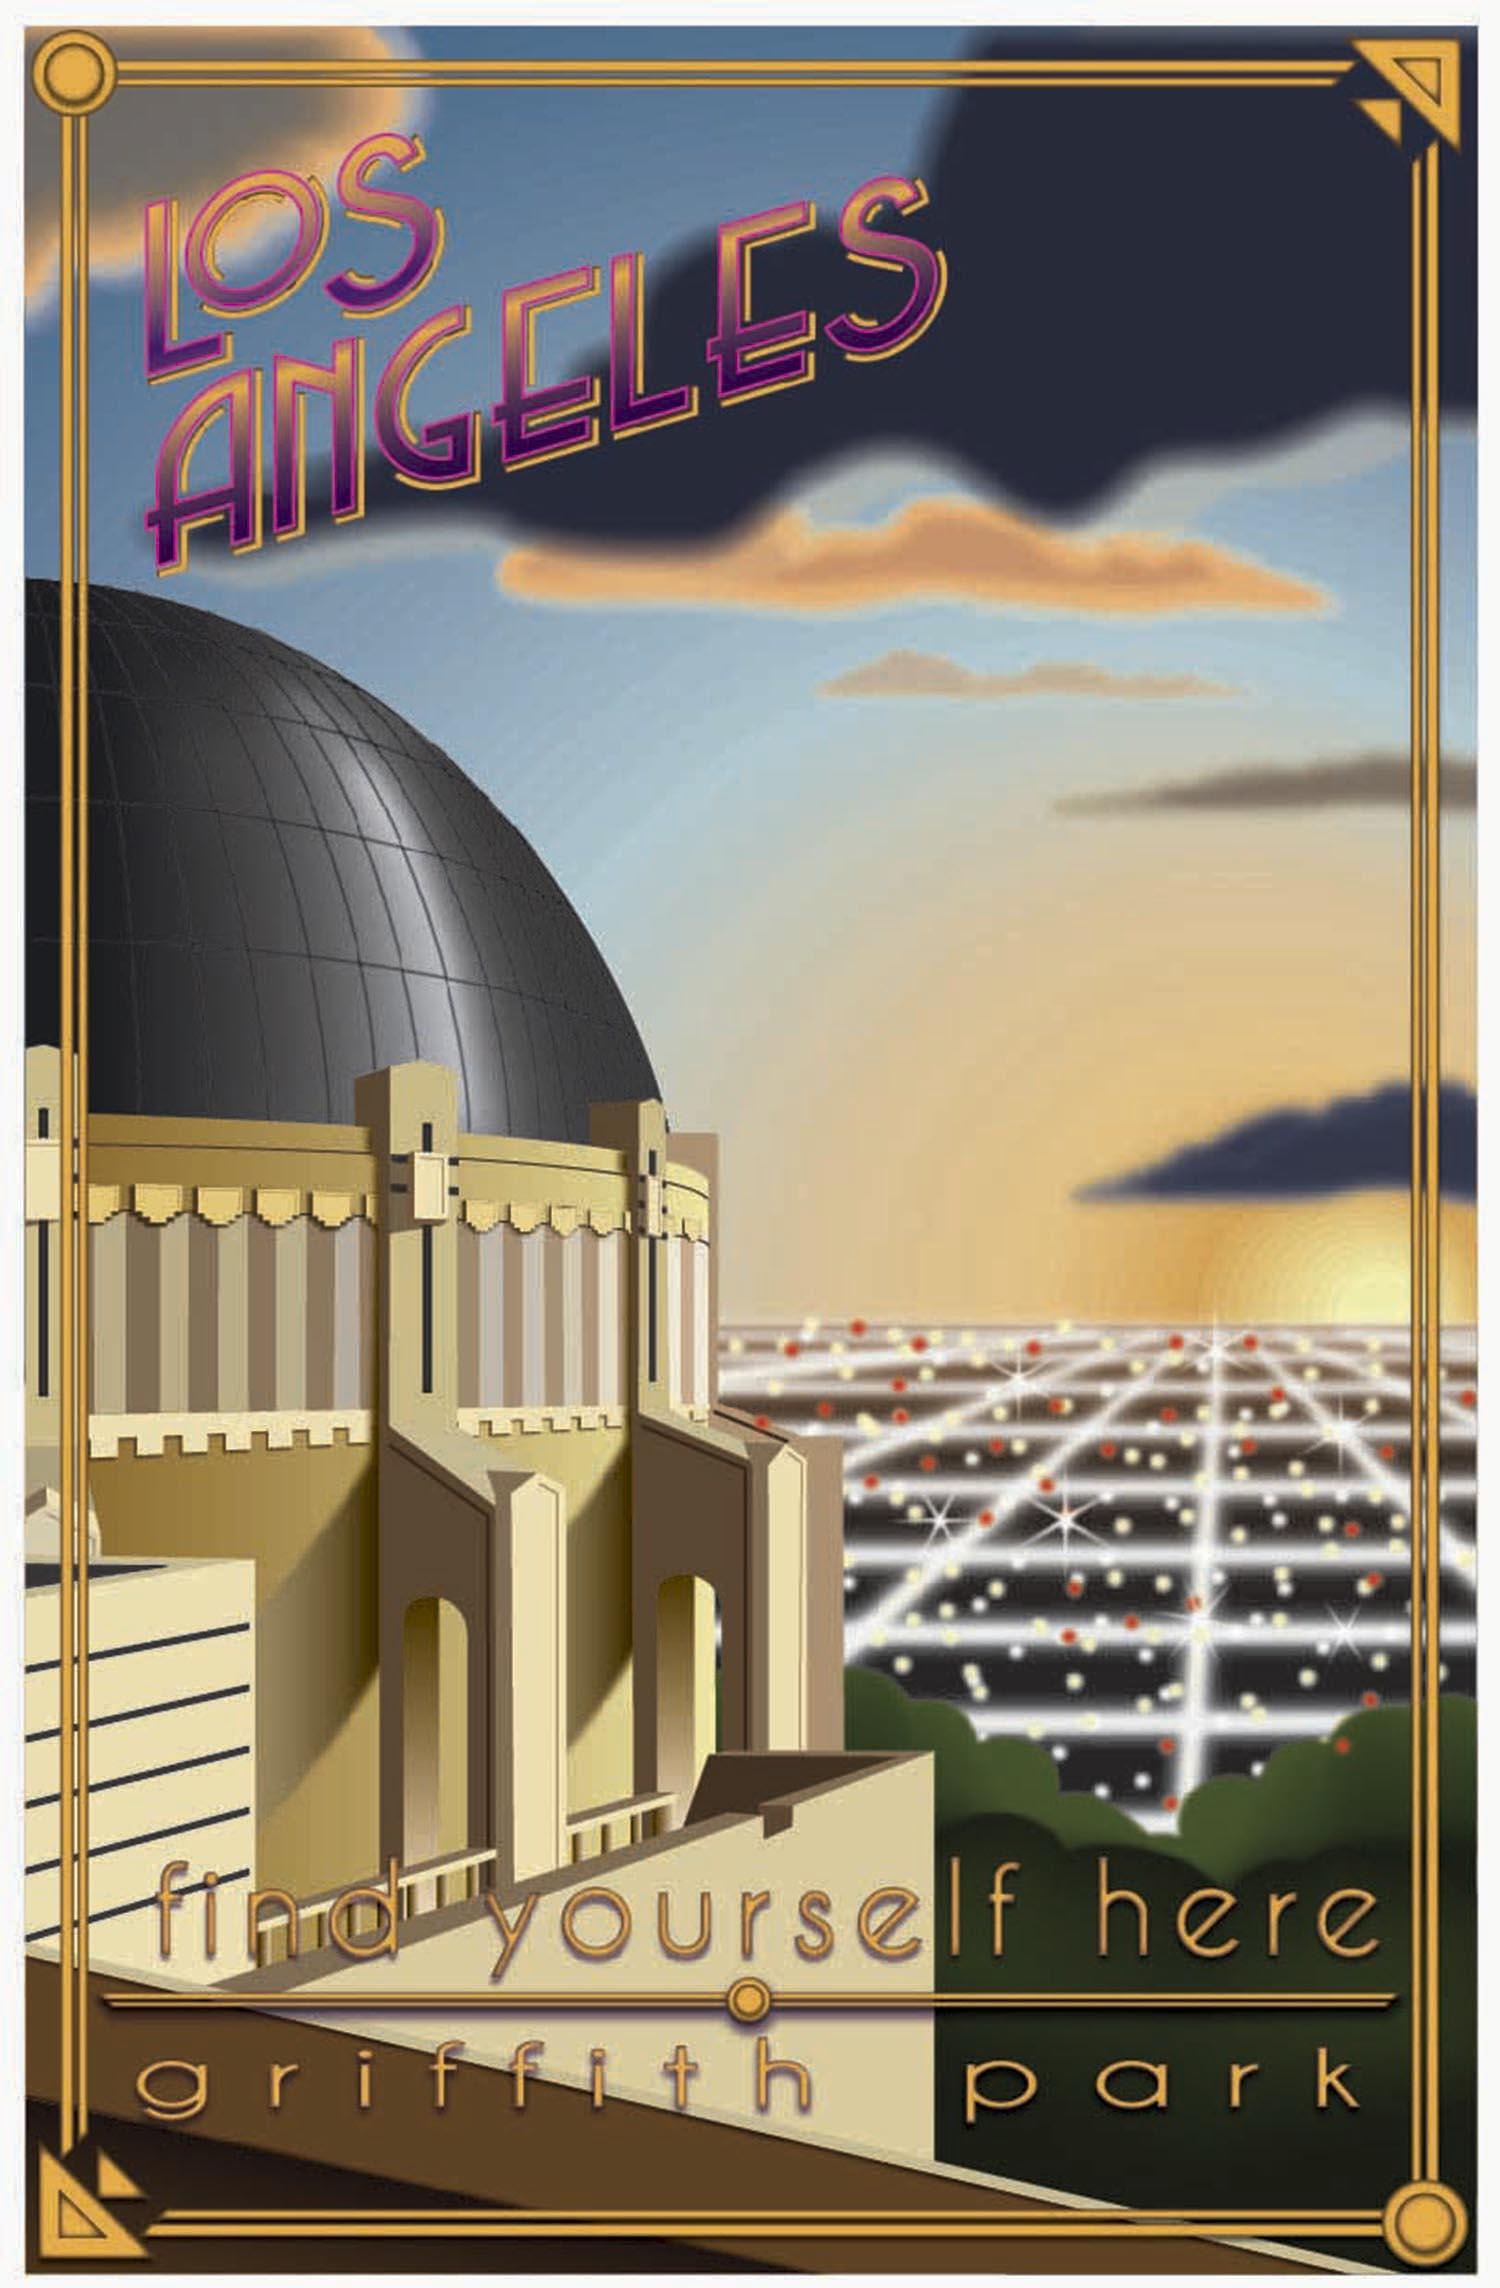 Posterr Griffith Park 01.jpg